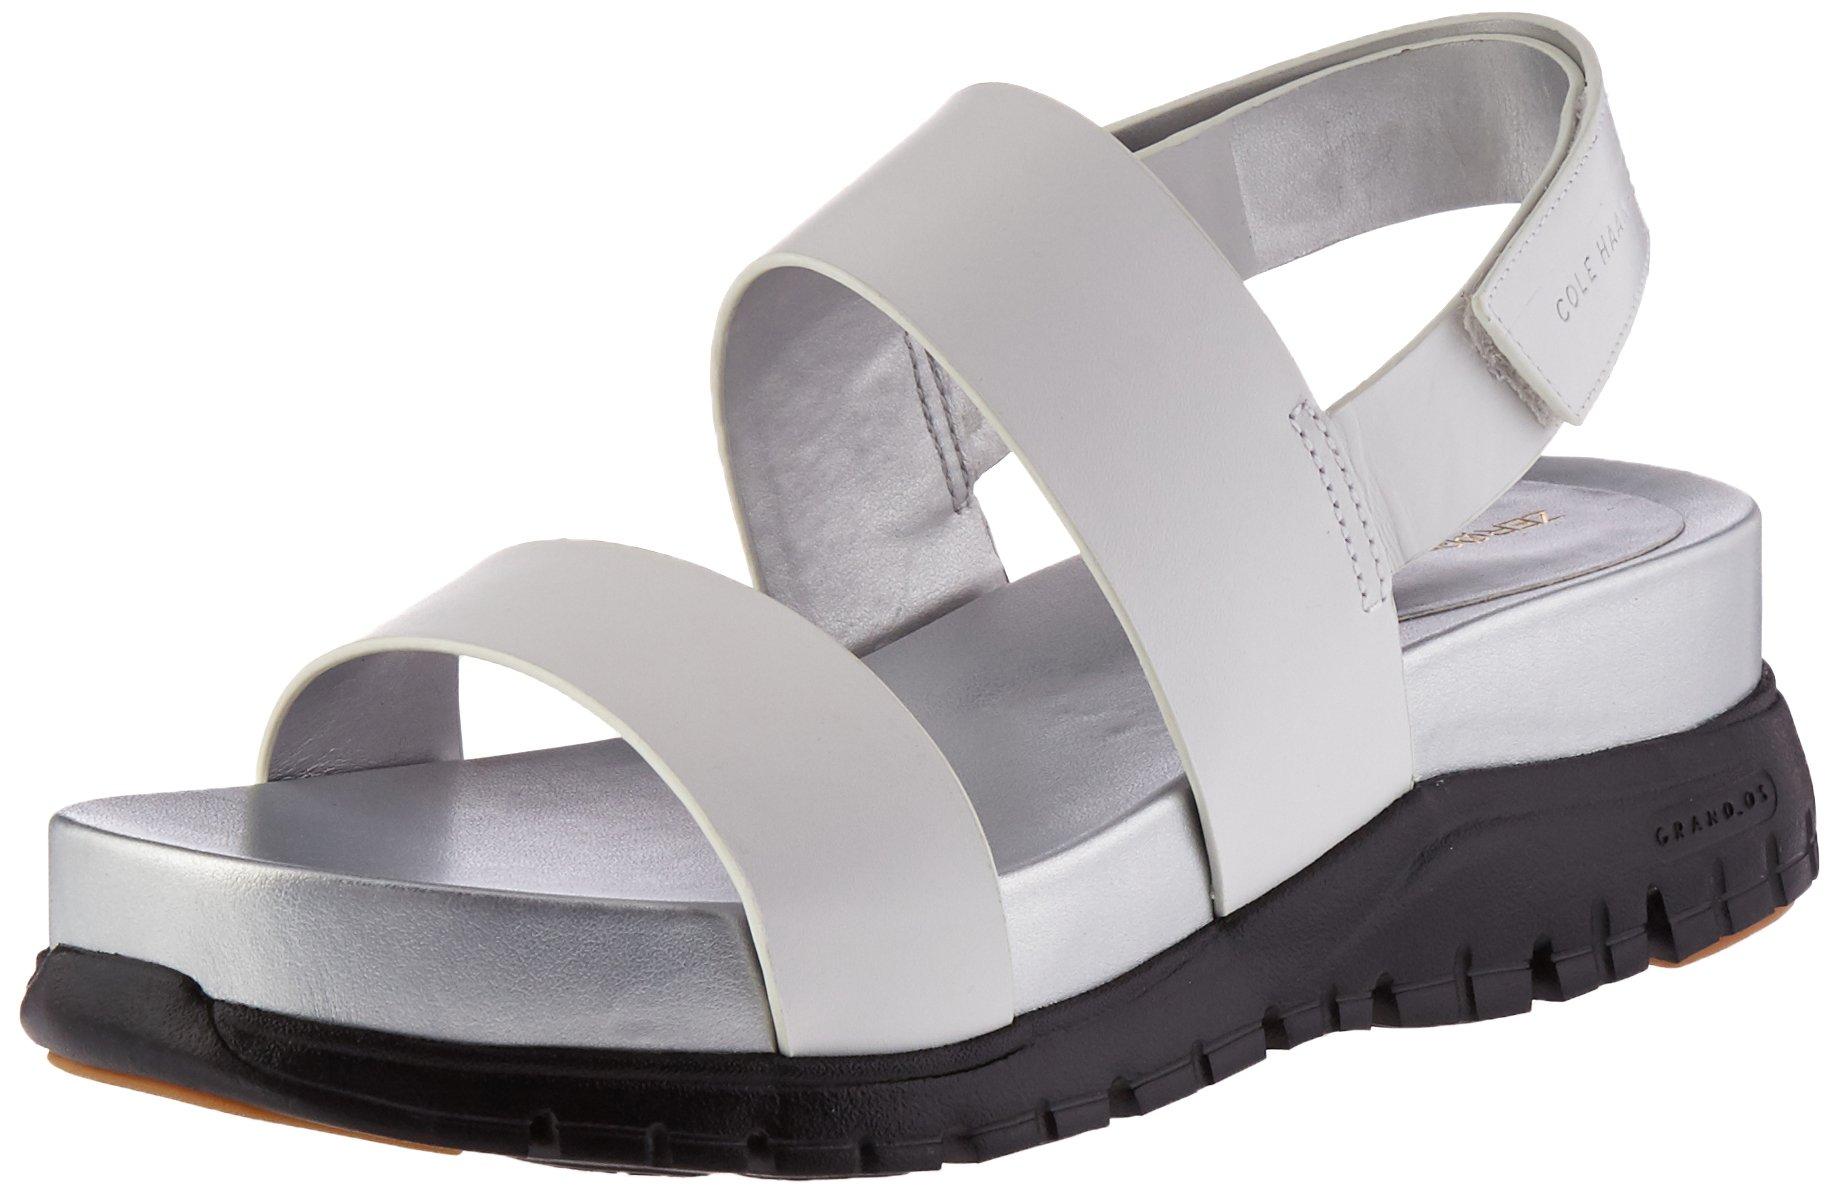 Cole Haan Women's Zerogrand Slide Platform Sandal, Optic White Leather/CH Argento/Black, 10 B US